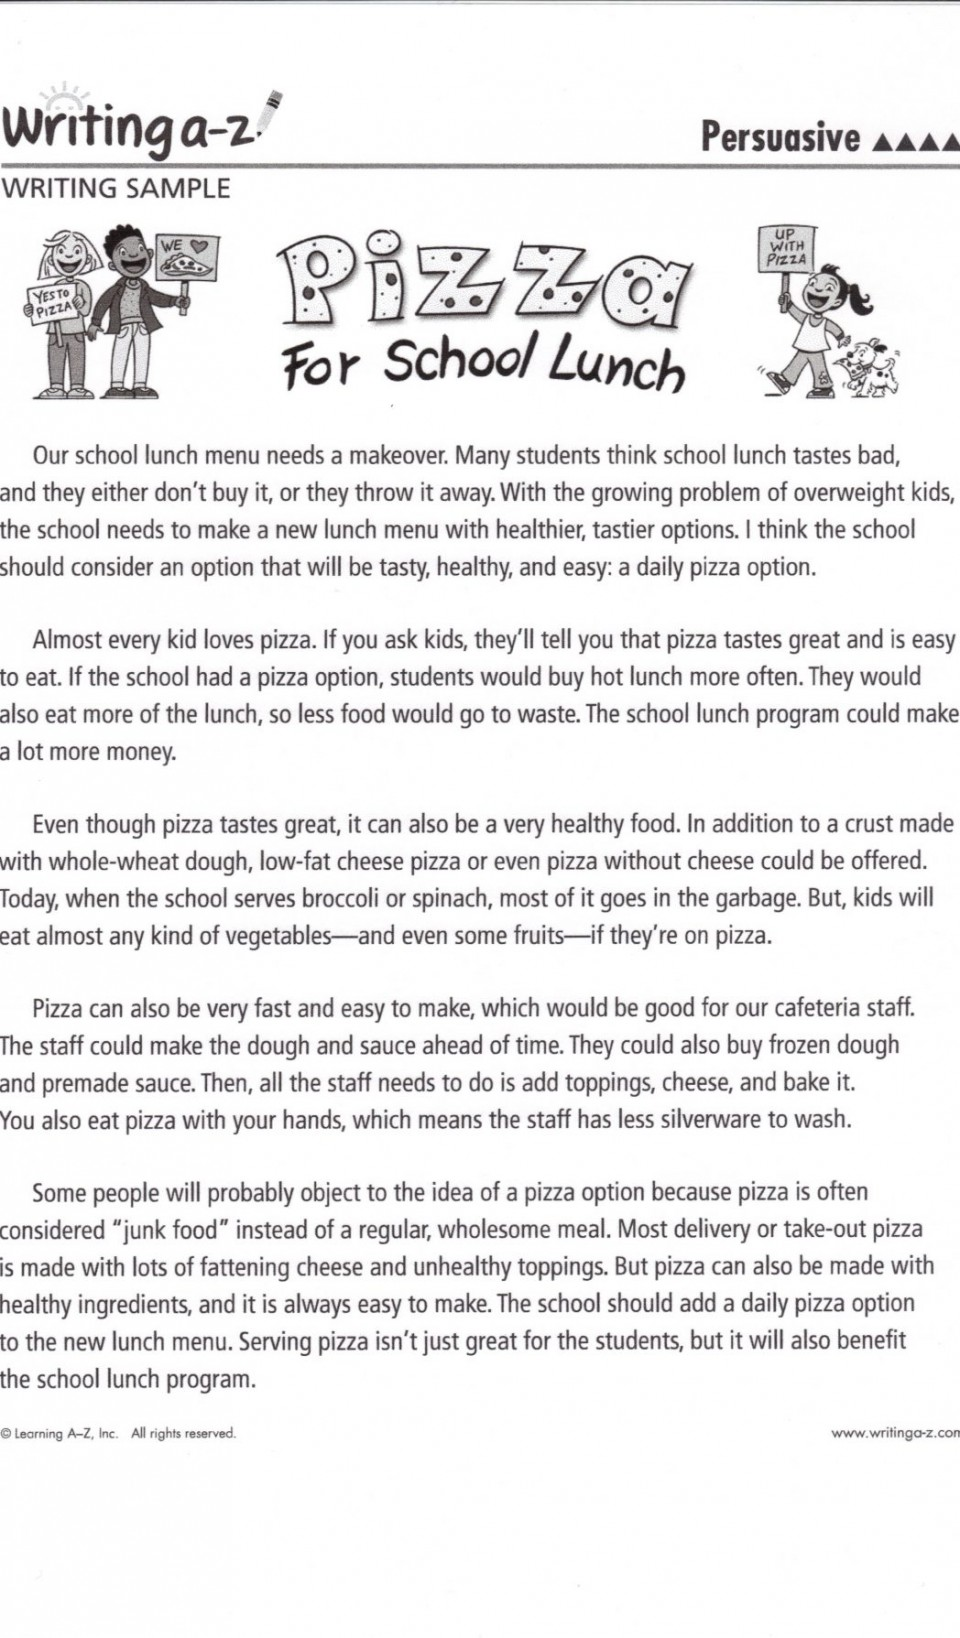 essay example public health healthy people writingessayweb    healthy eating essay example high school persuasive topics sample  essays writing article argumentative impressive pt